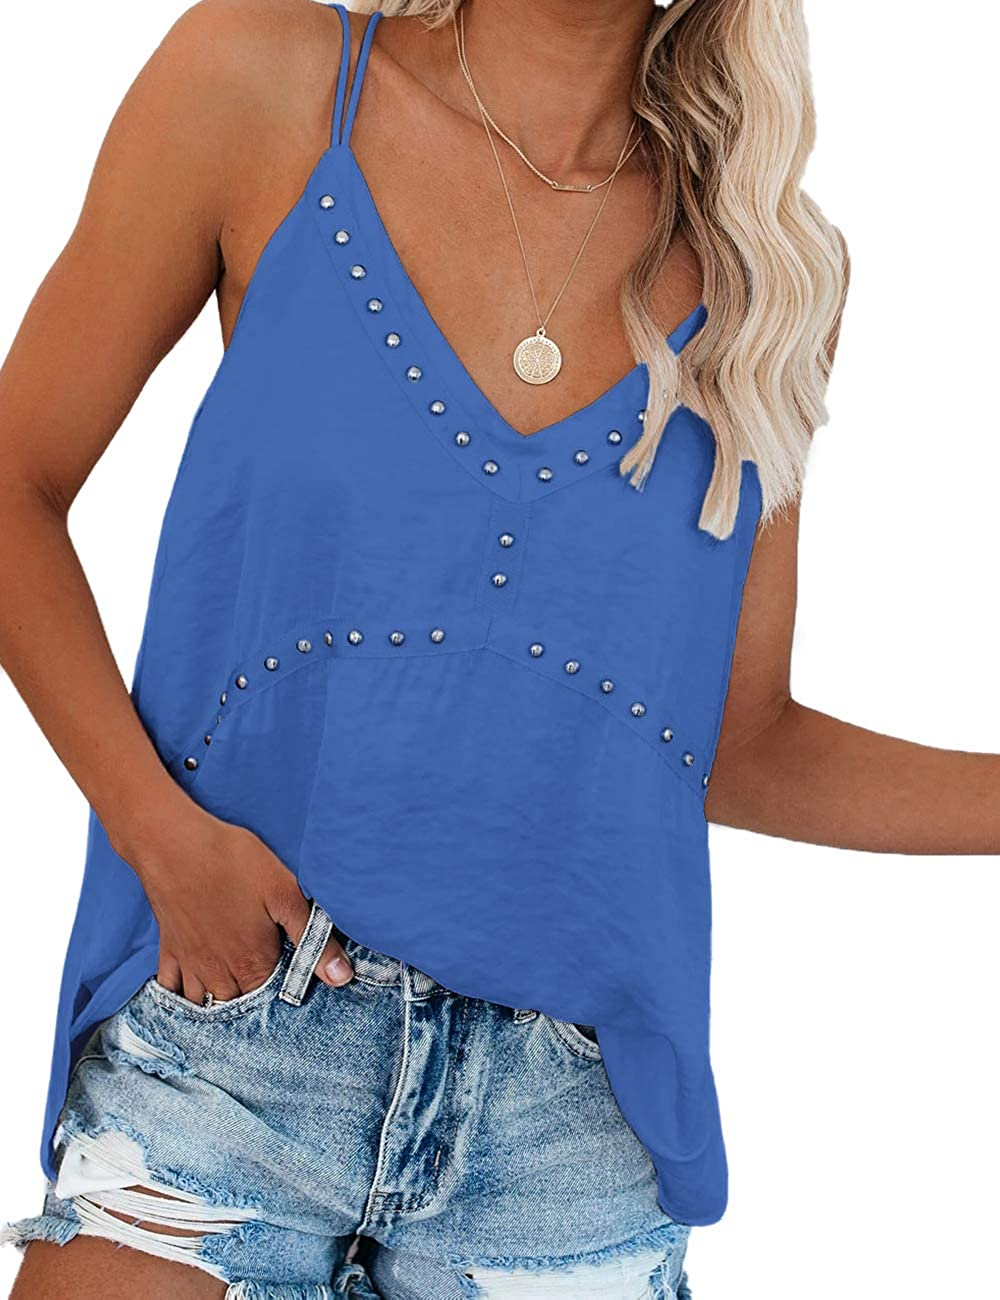 SELINK Women V Neck Spaghetti Strap Tank Tops Casual Sleeveless Cami Shirts